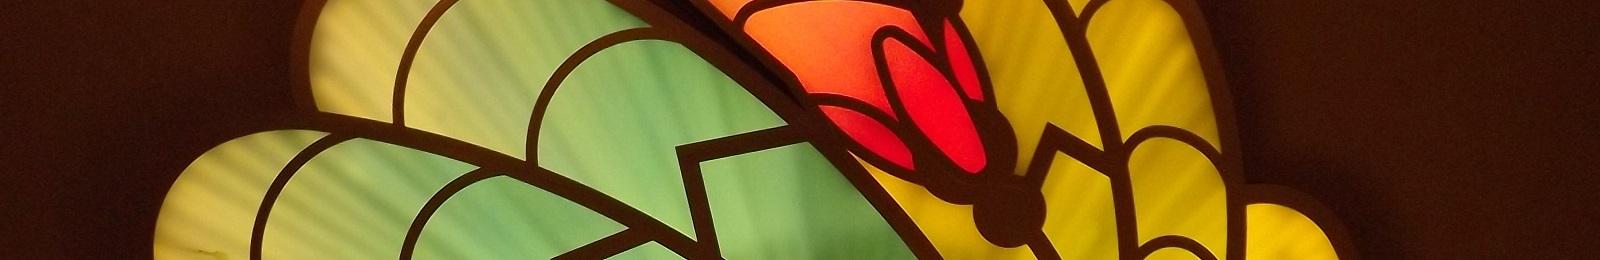 Chandelier Color Detail